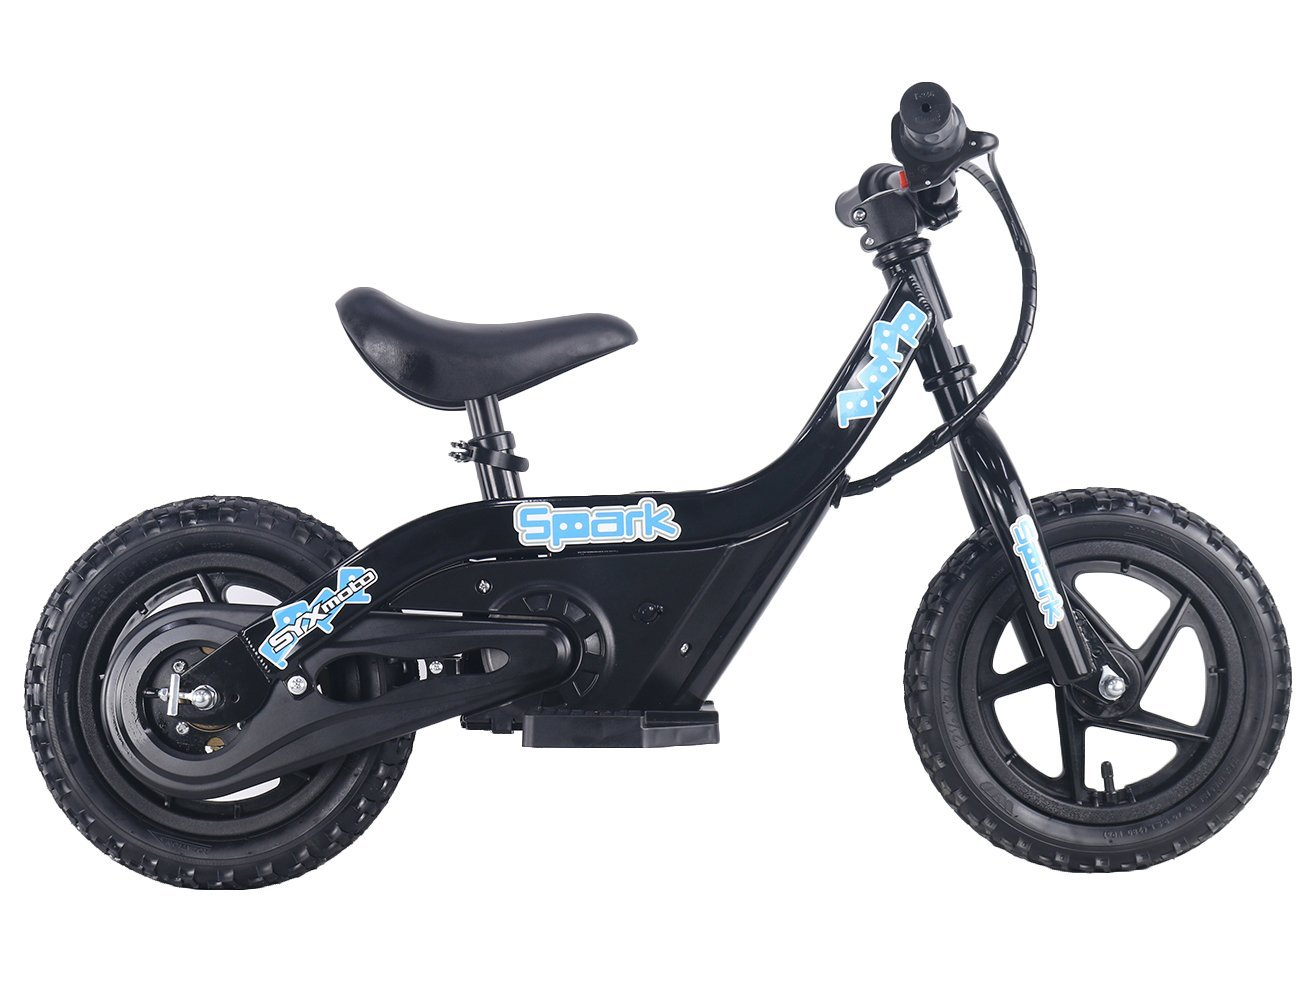 SYX MOTO SPARK Mini Electric Balance Bike Off Road, Black